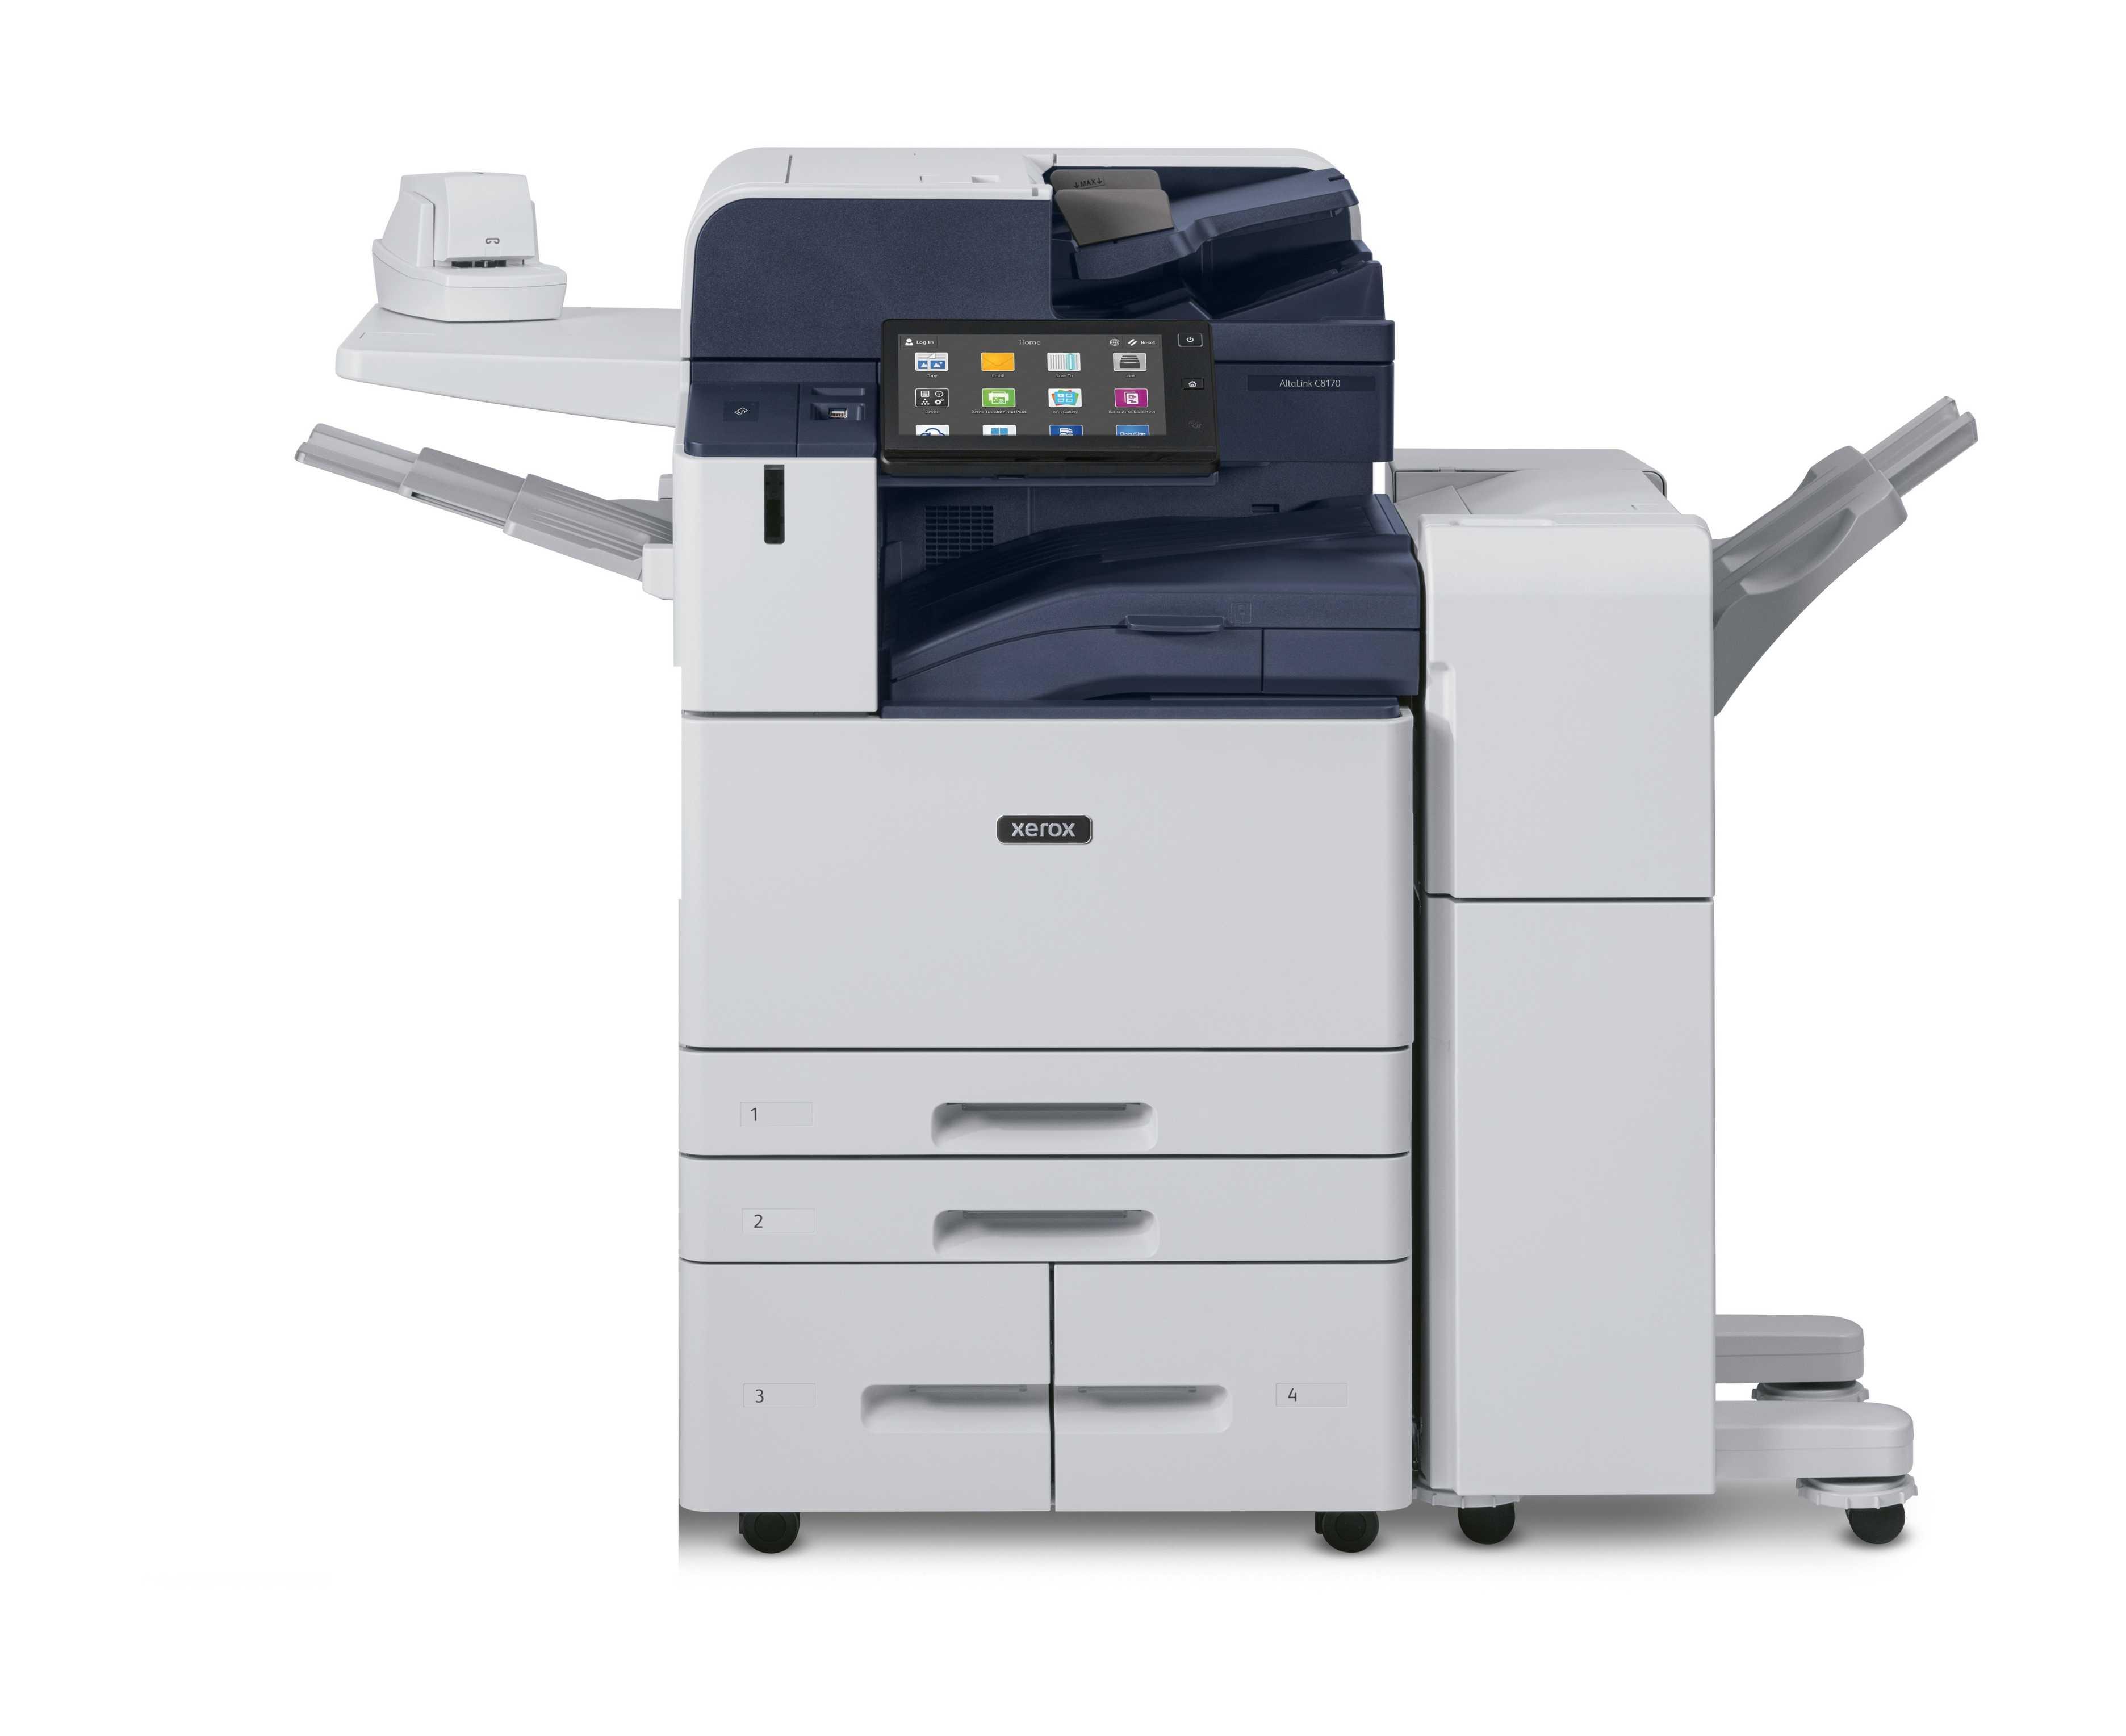 Impresora multifunción Xerox AltaLink C8135